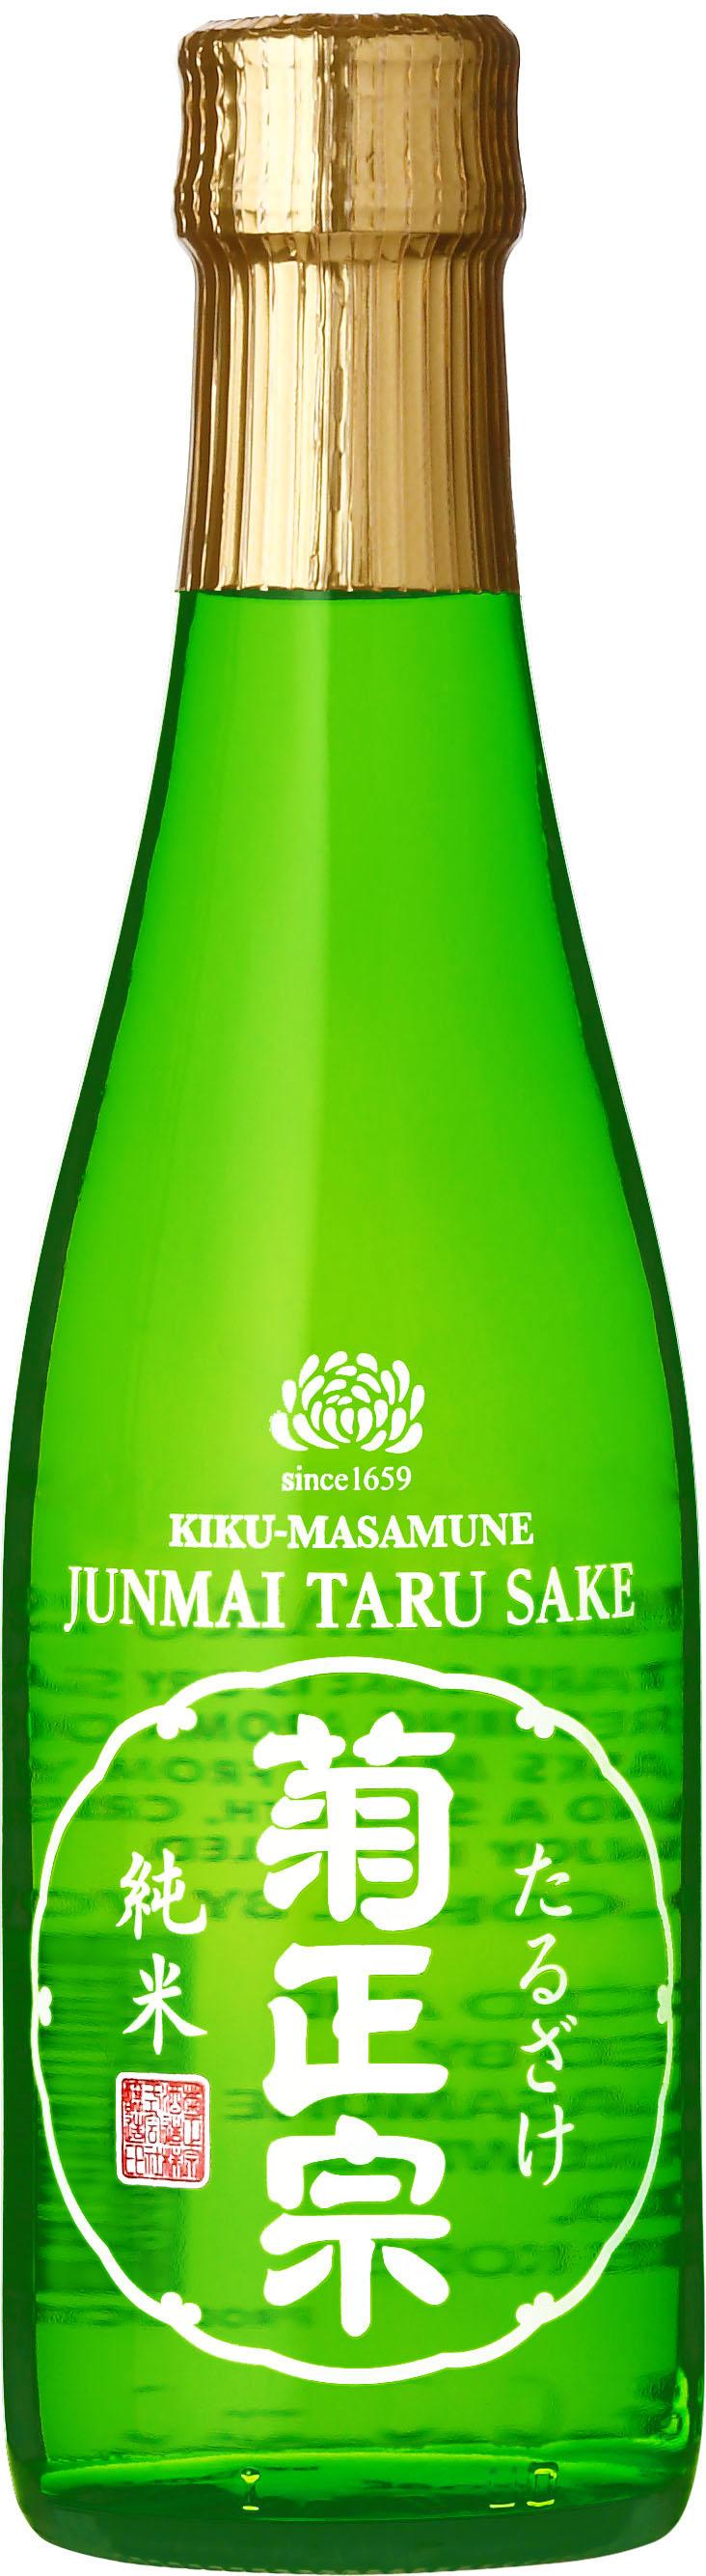 Kiku Masamune Junmai Taru Sake